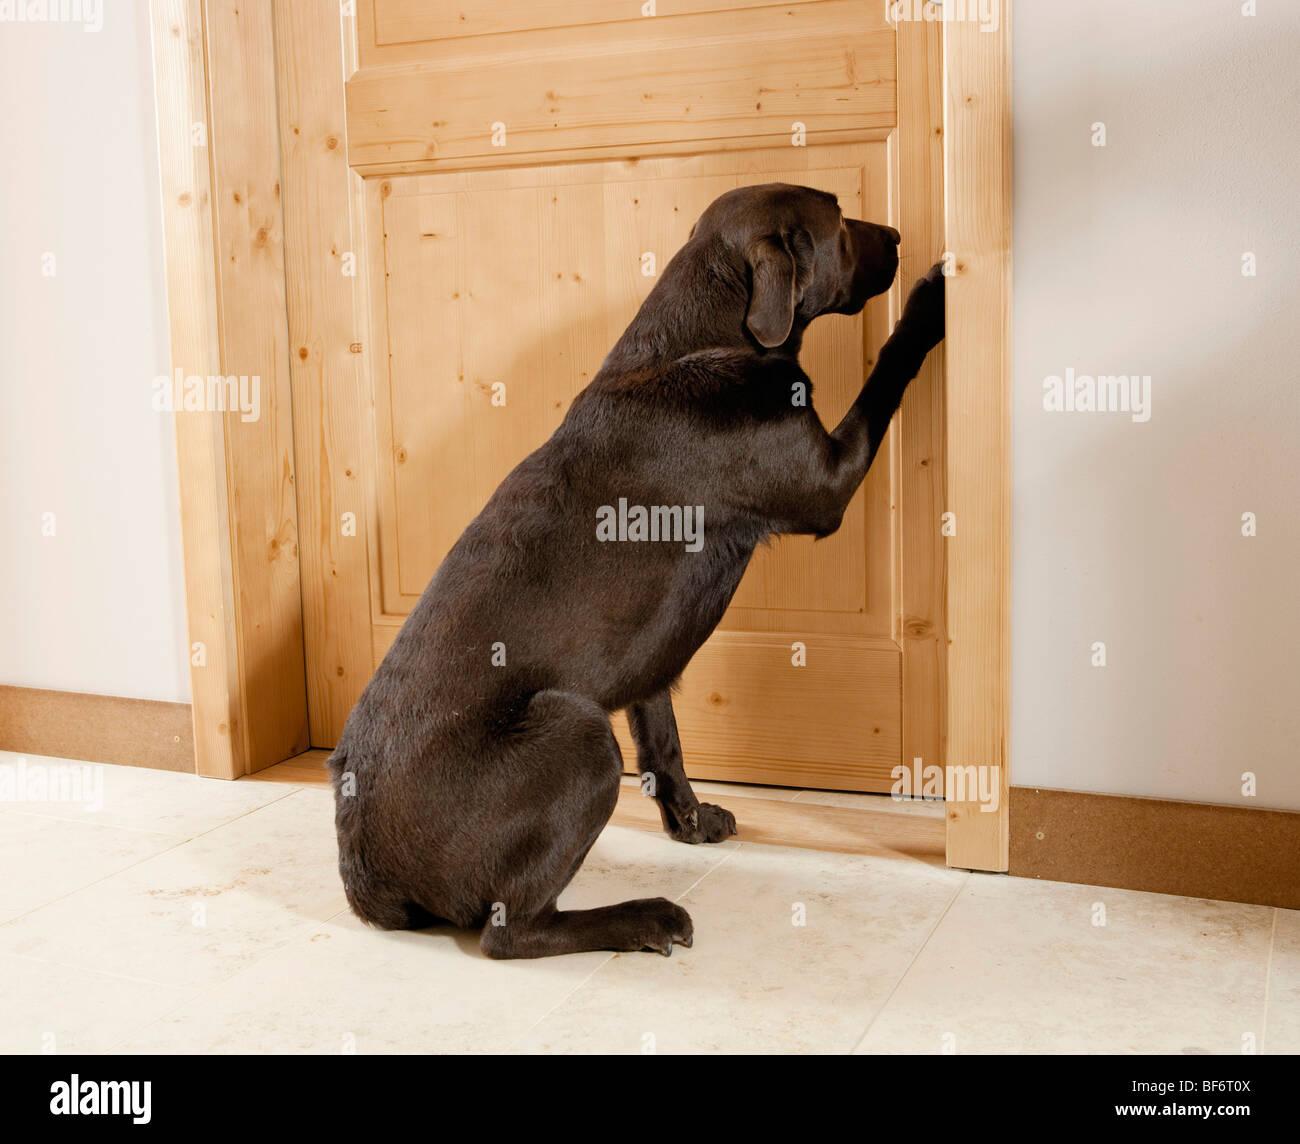 Beau Bad Habit : Labrador Retriever Scratching At Door   Stock Image